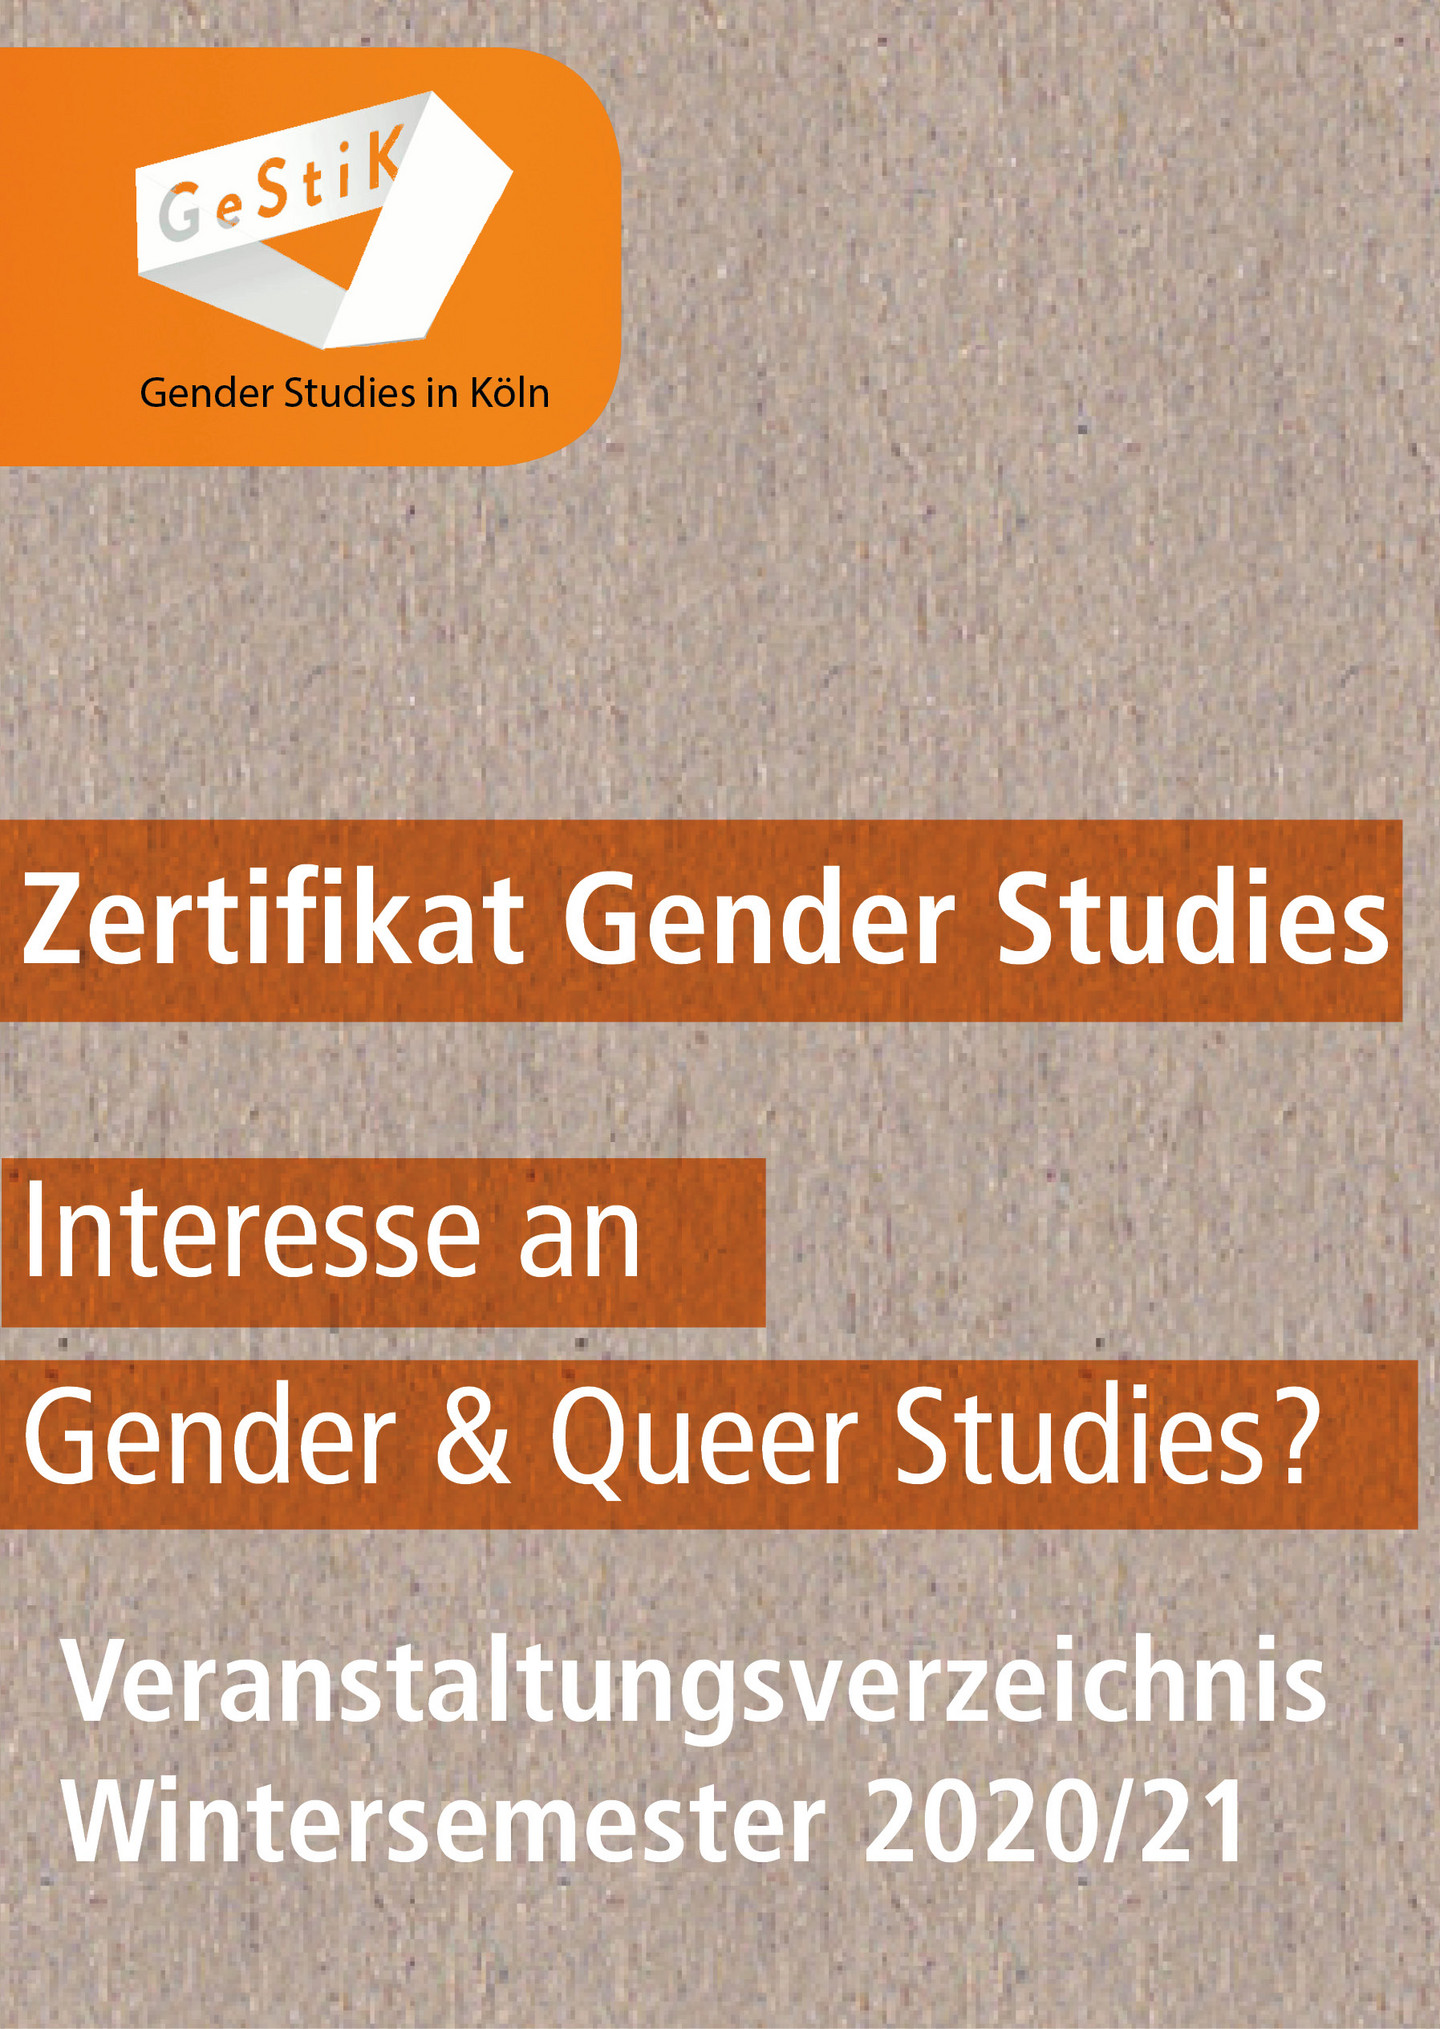 Gender Studies Köln